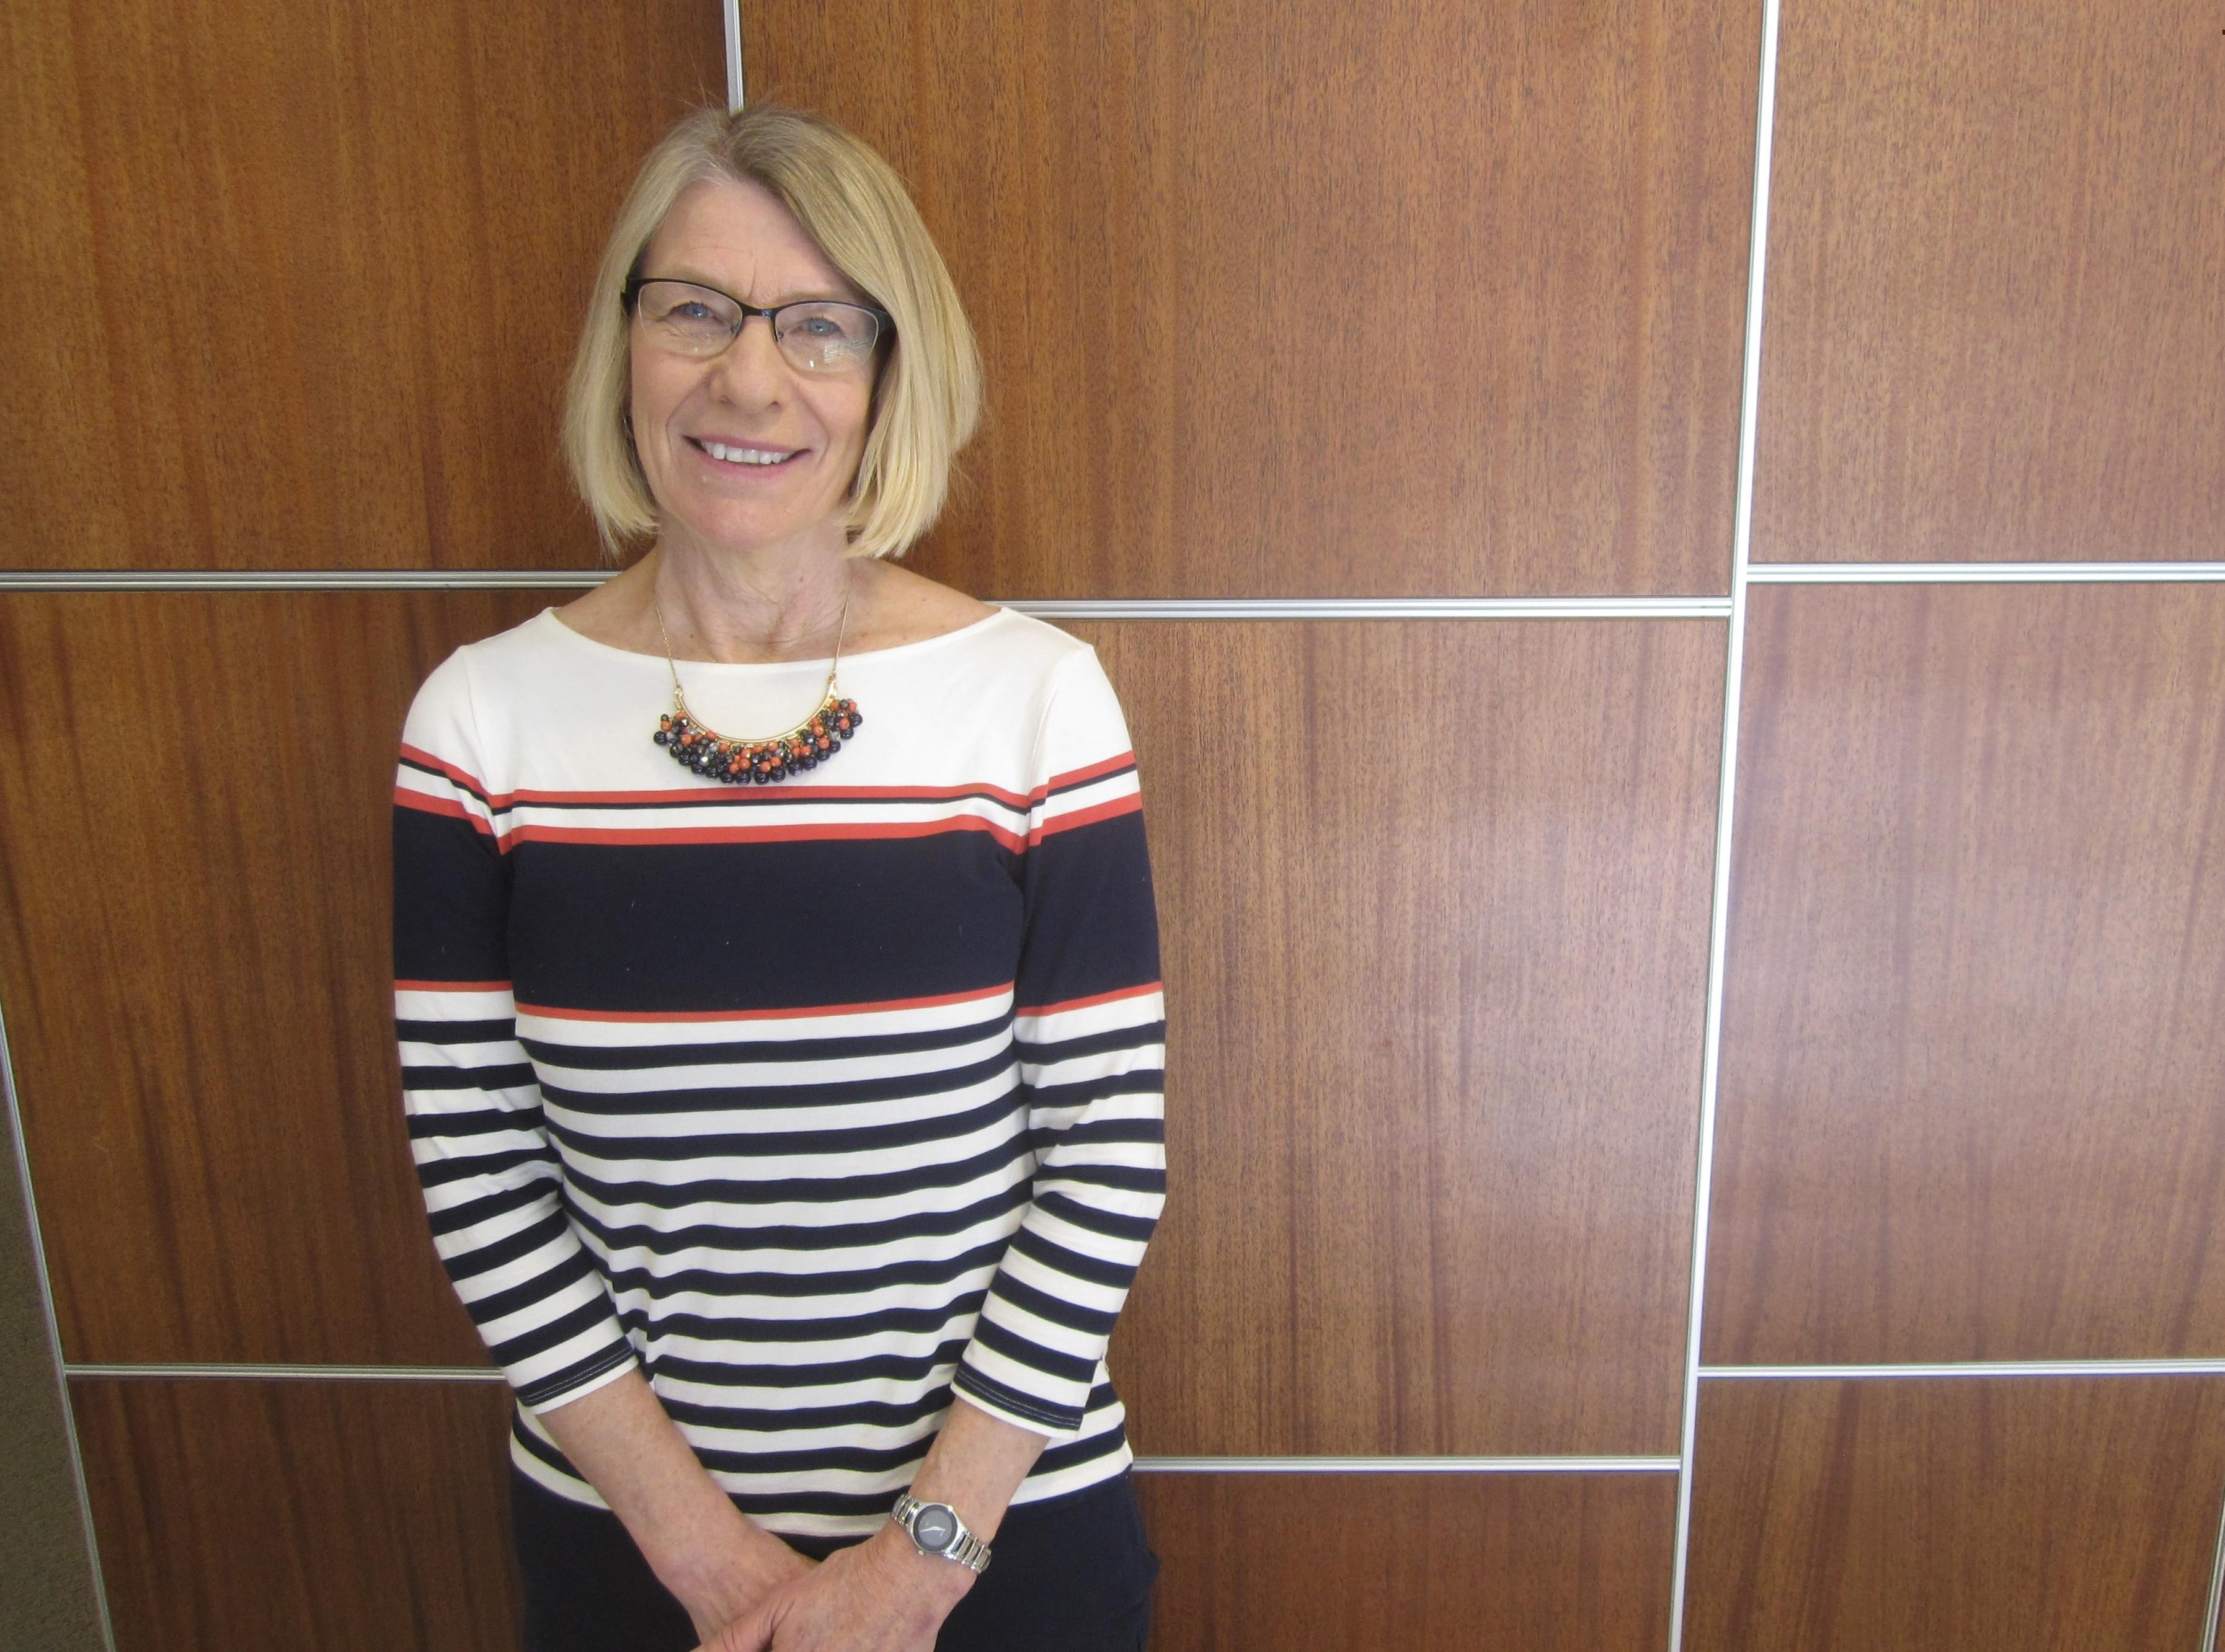 Mayoral candidate and Urbana Alderwoman Diane Marlin.